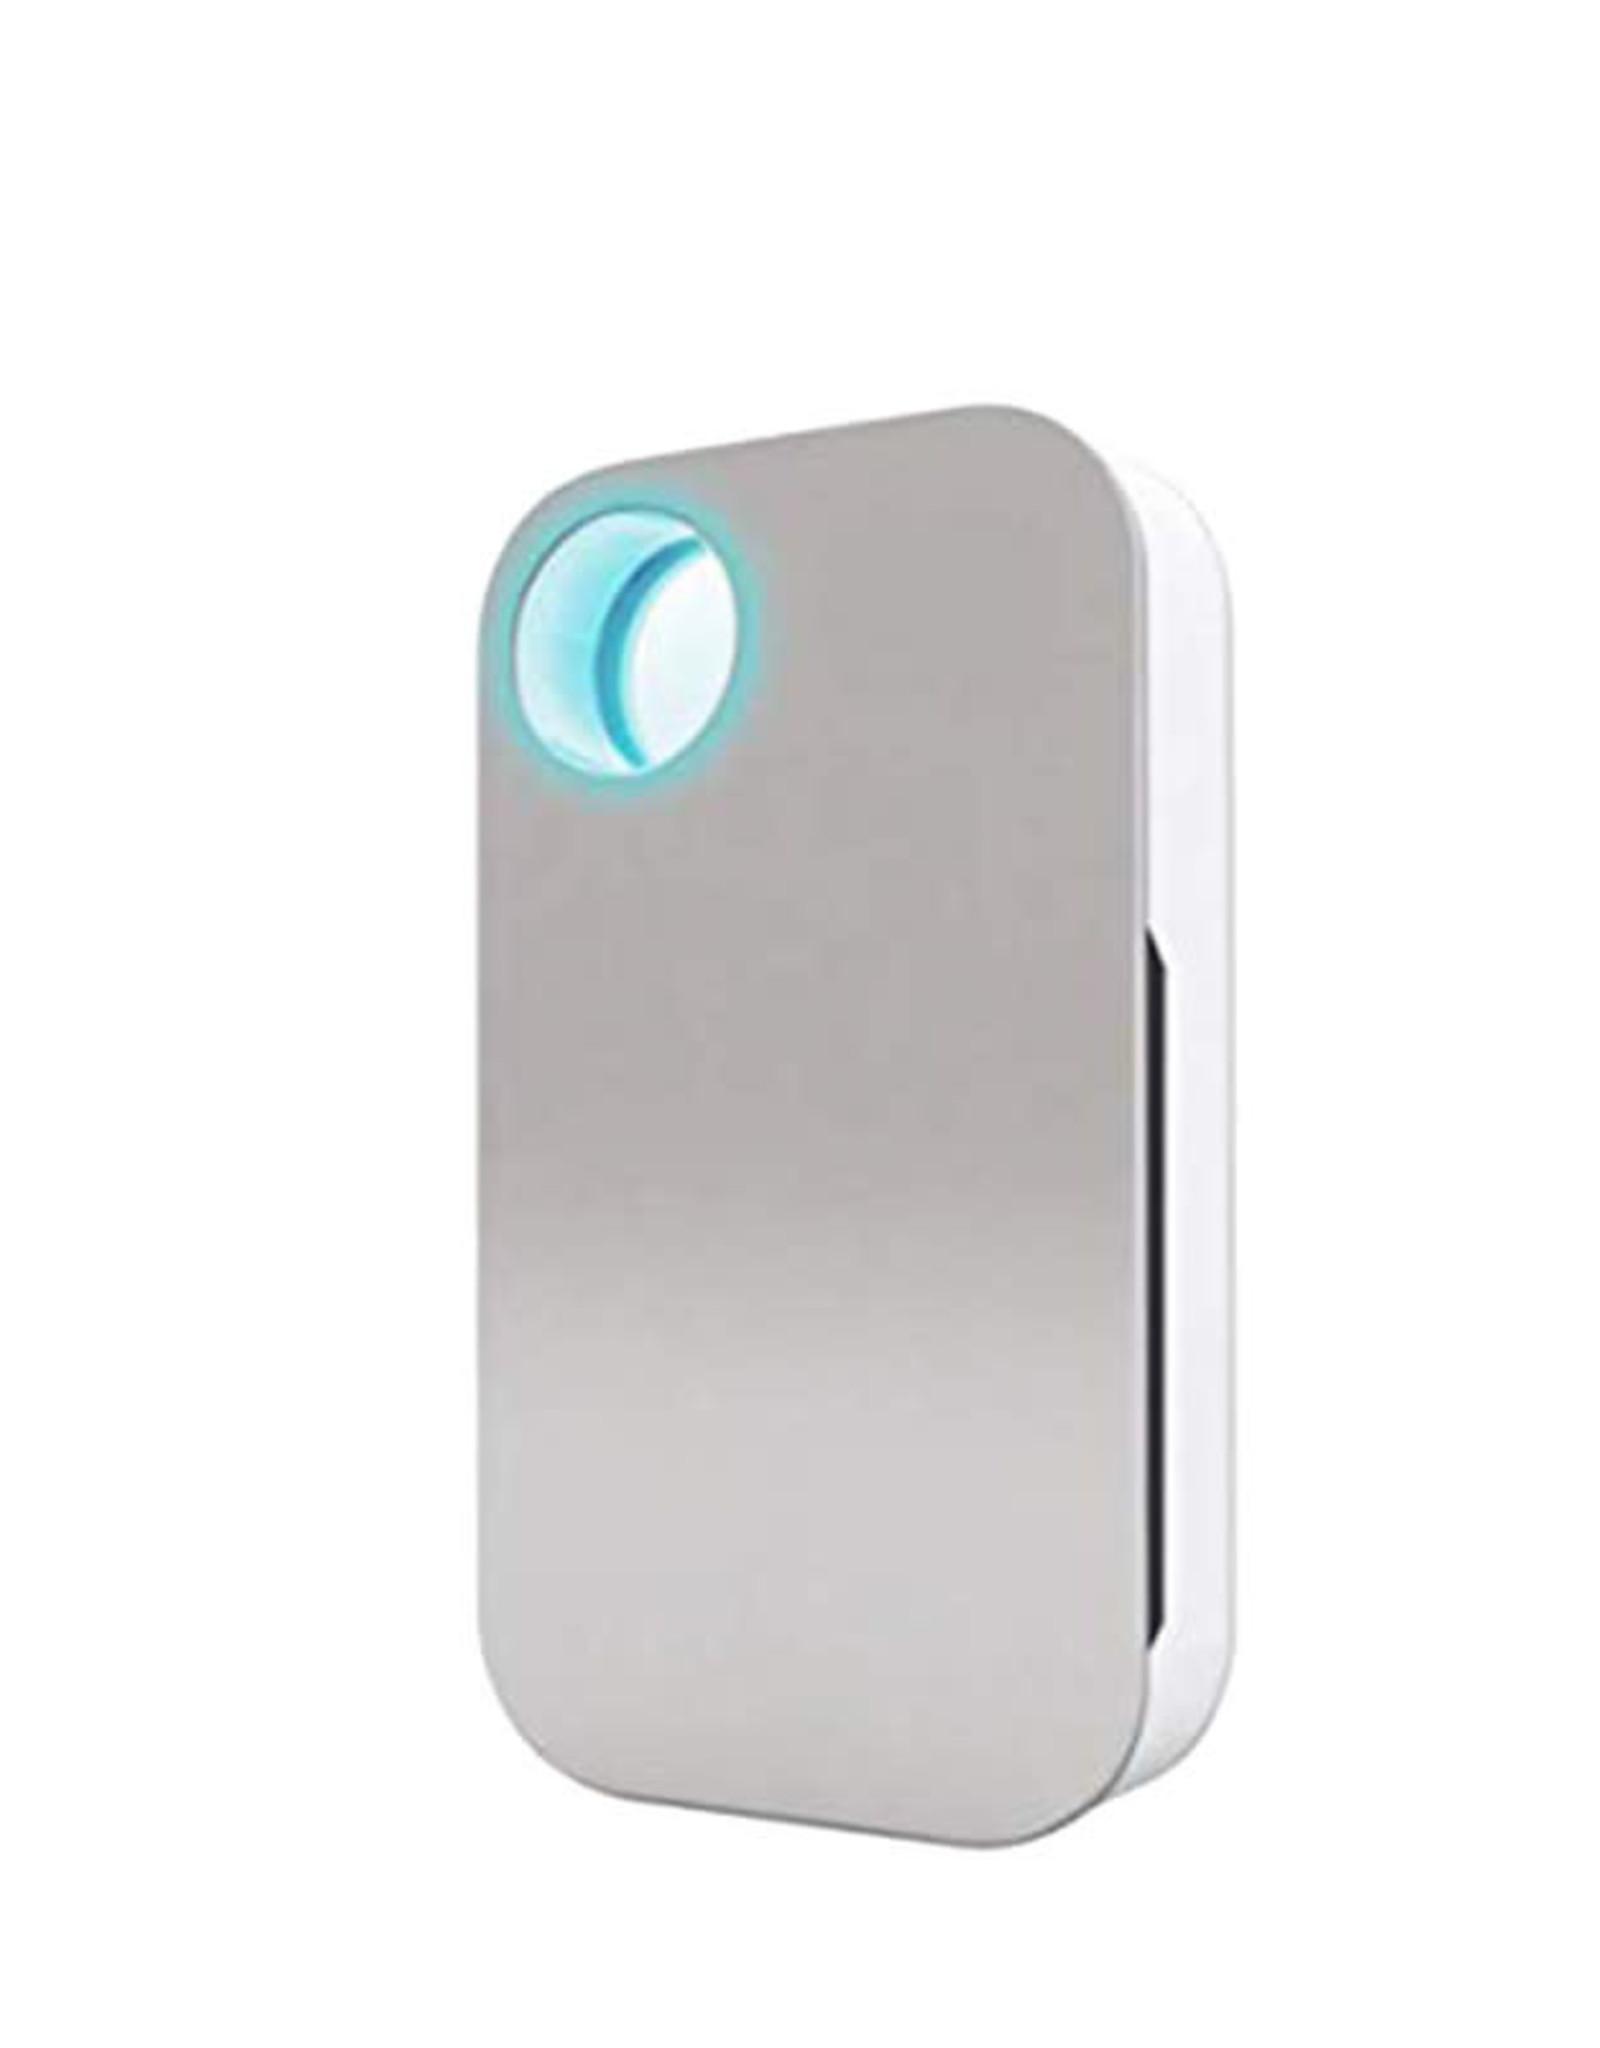 Plug In  negative ion device